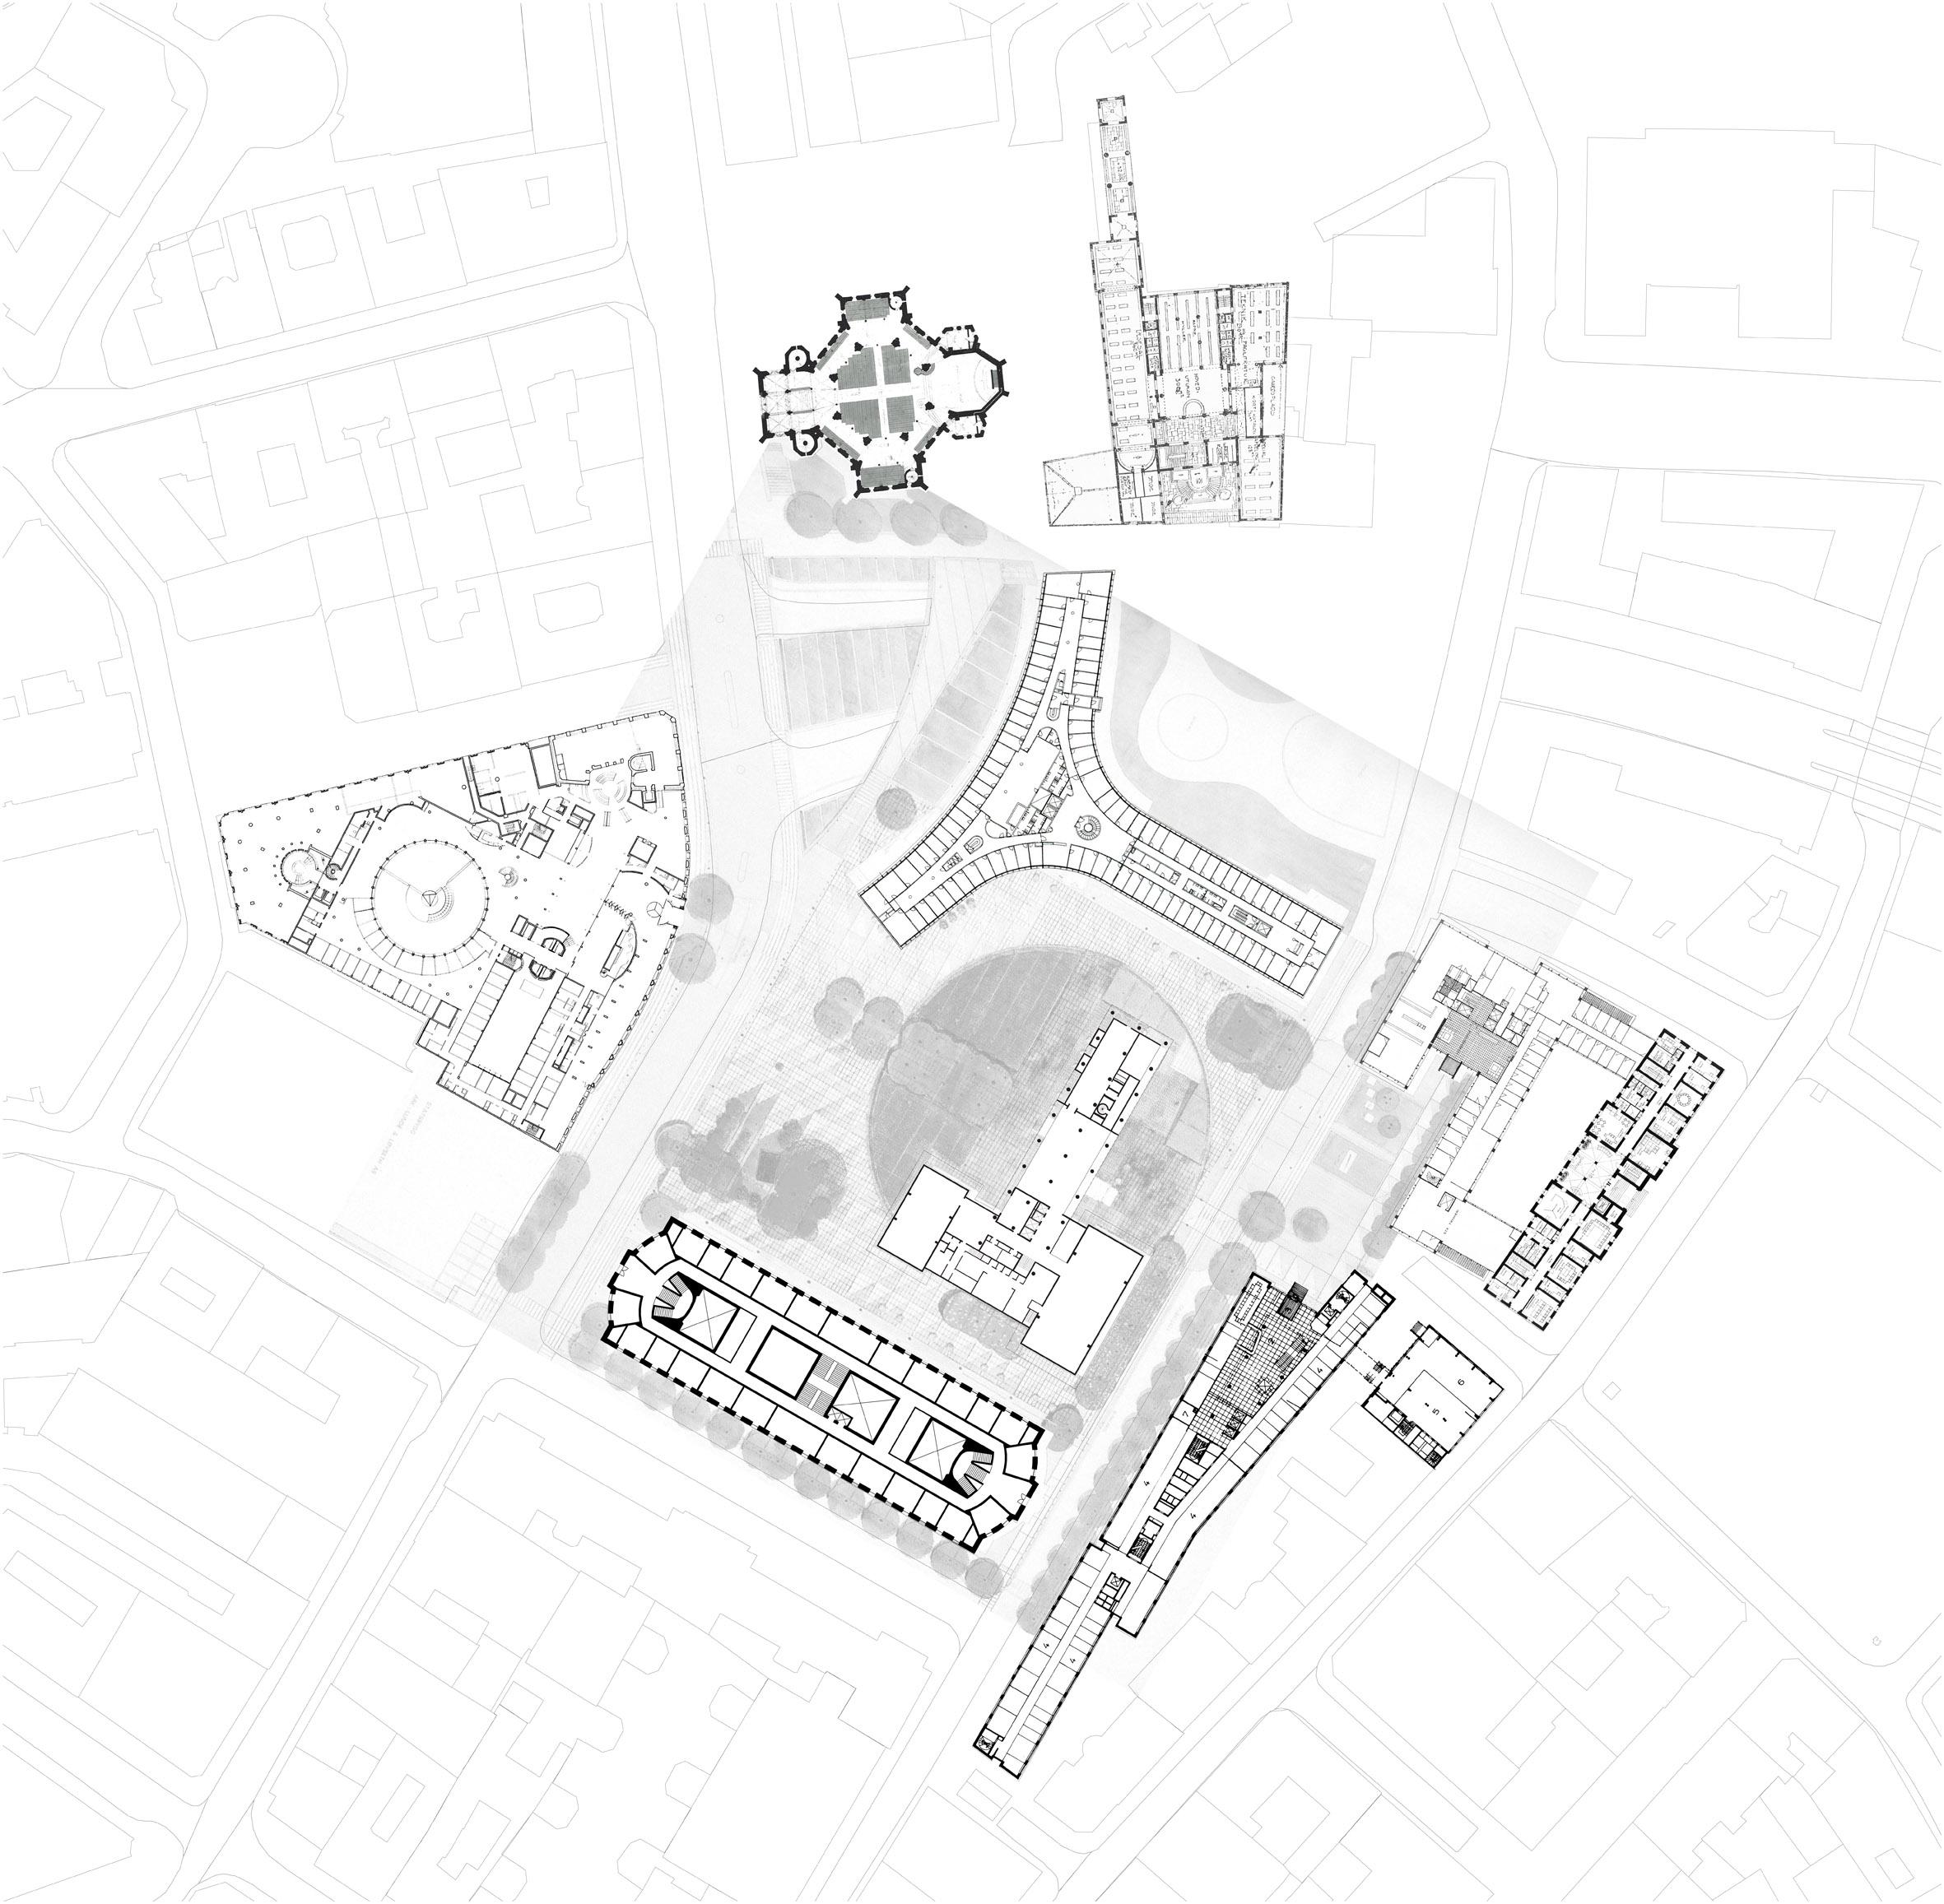 /Volumes/Henke V/London Met/5th YEAR/Studio/Maps/Plan1_10000 A3.